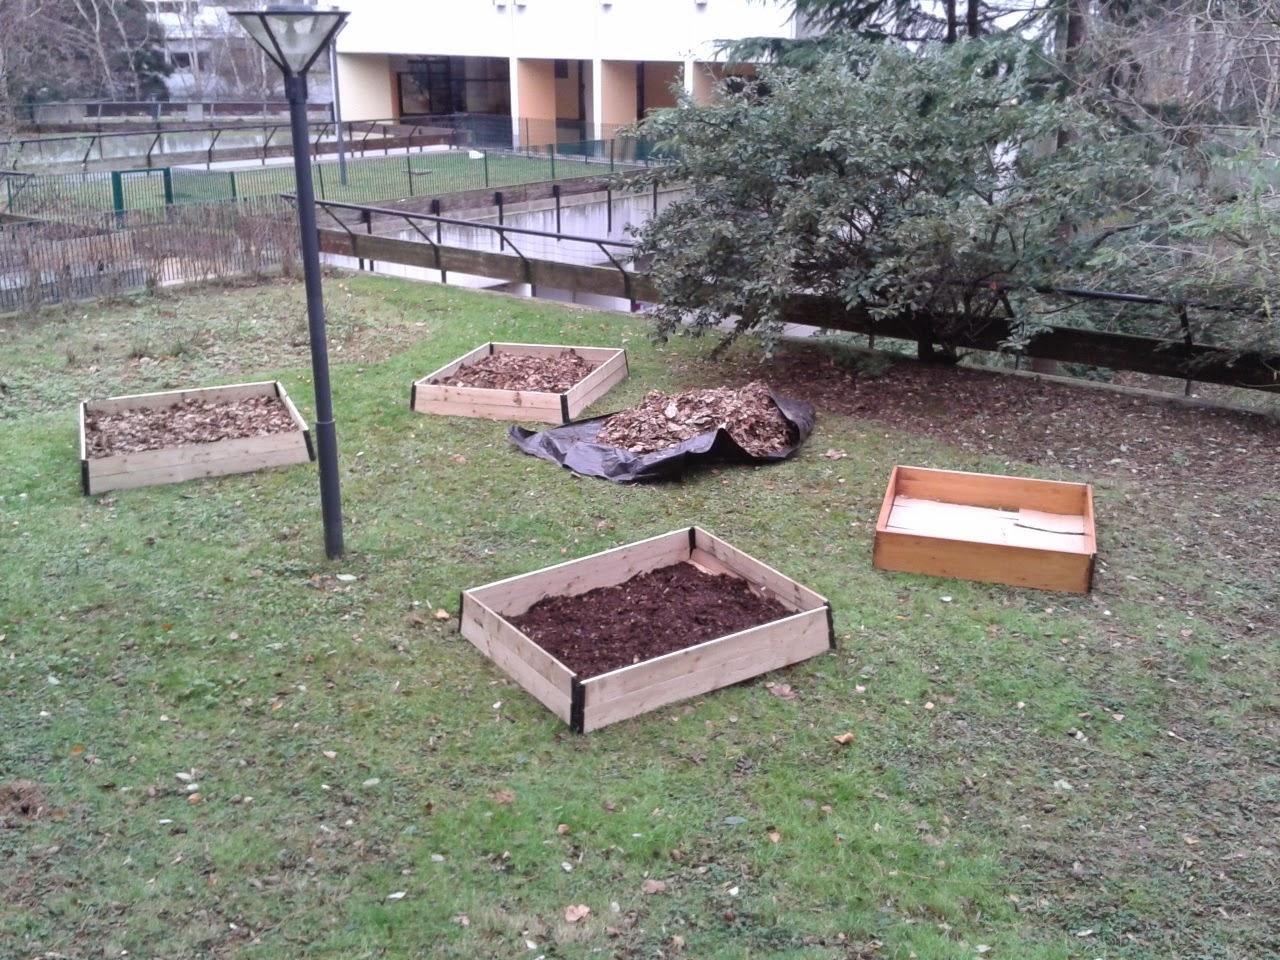 Jardin santerre 107 rue de reuilly paris janvier 2015 for Habitat jardin 2015